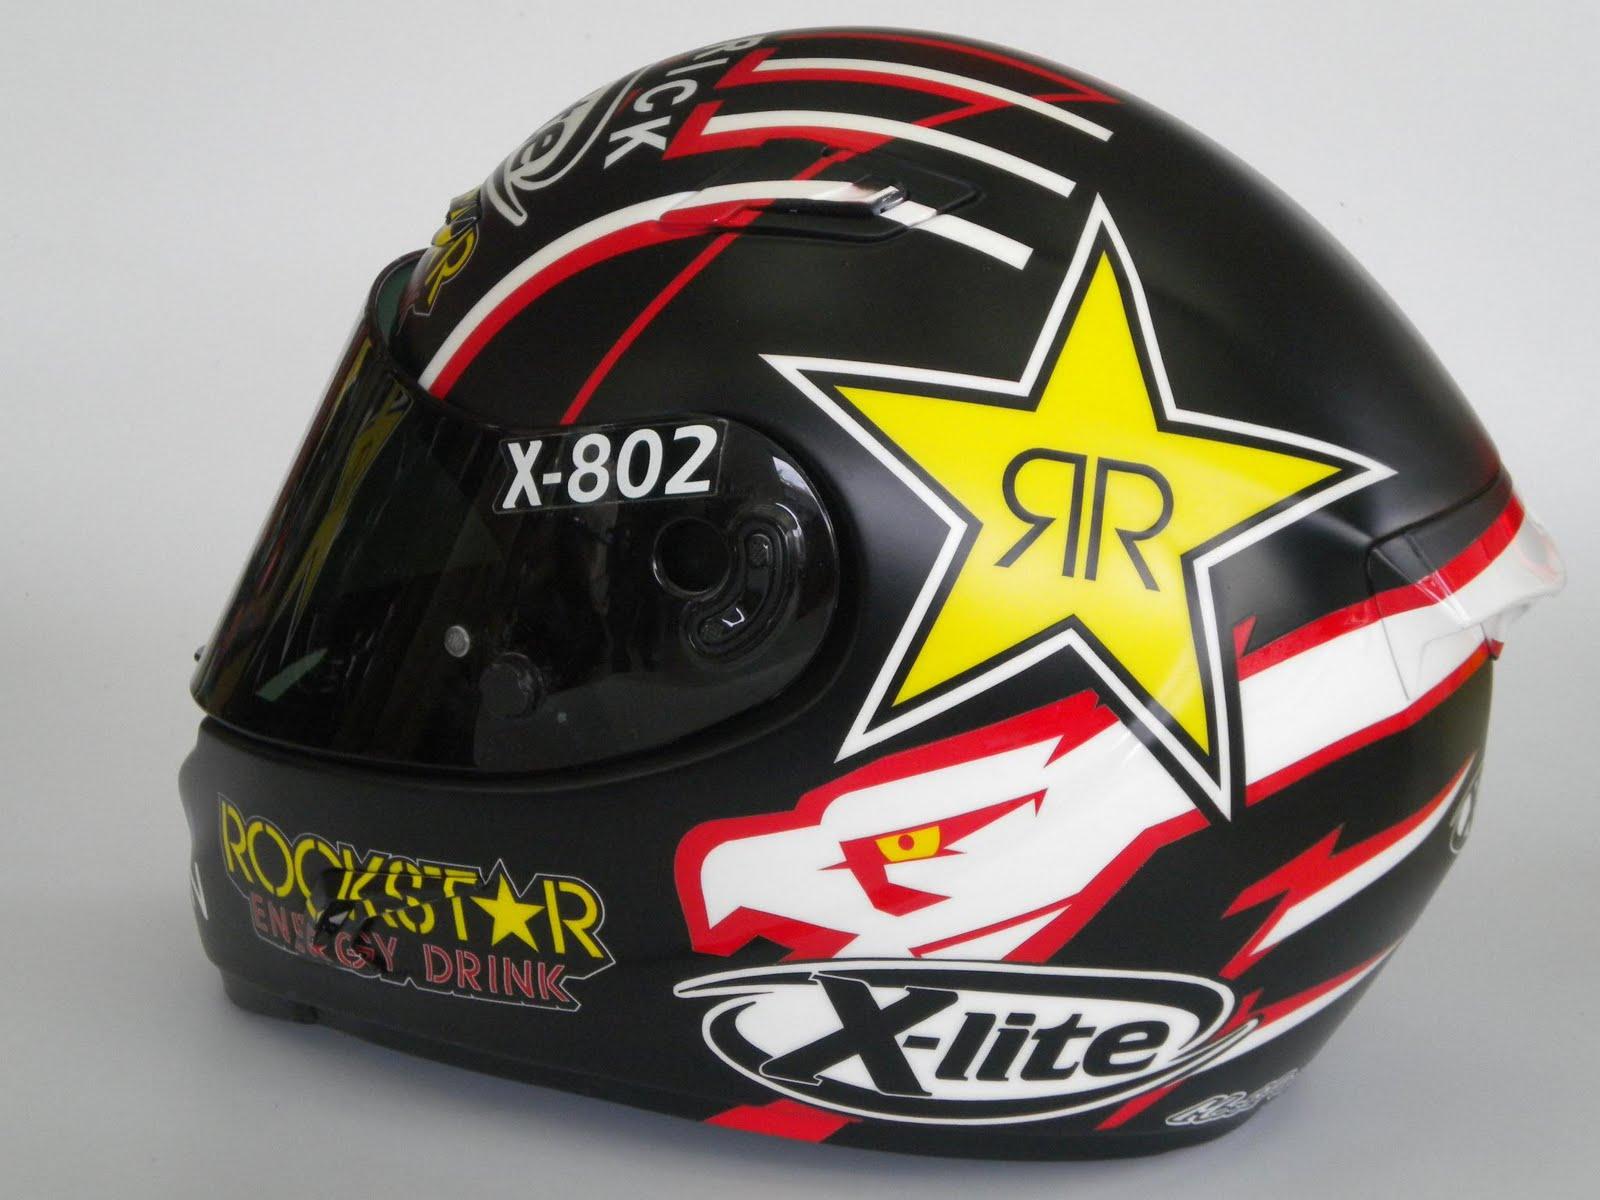 racing helmets garage x lite x 802 j lorenzo brno 2011 by. Black Bedroom Furniture Sets. Home Design Ideas